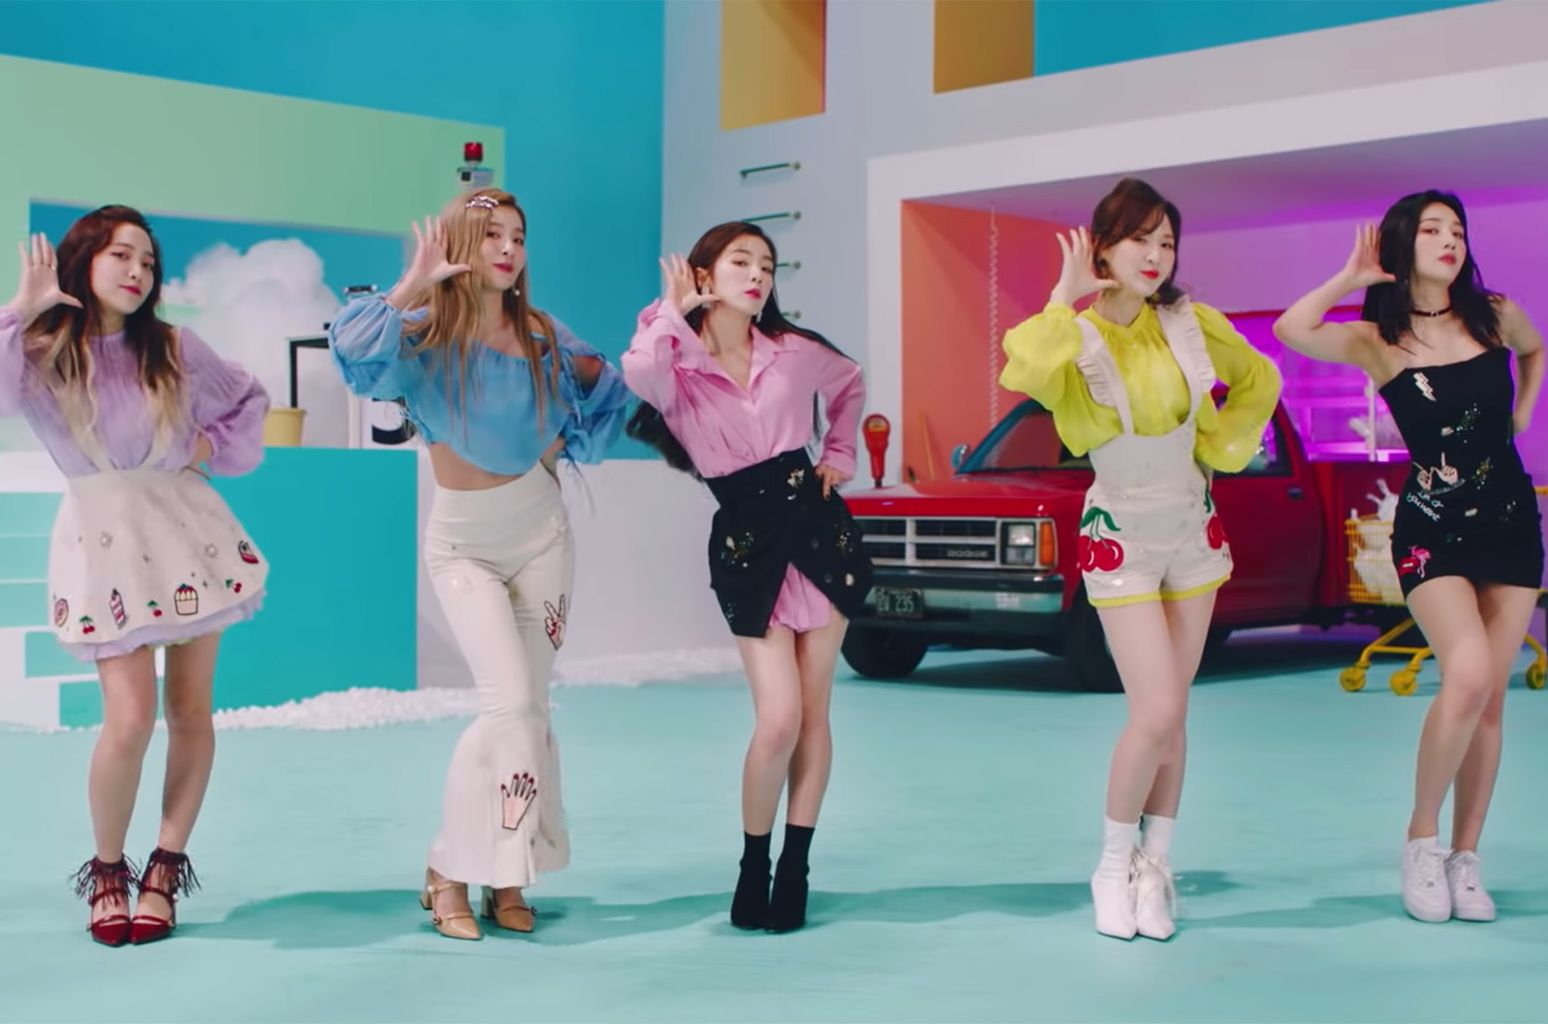 K Pop Girl Group Red Velvet Released Their Second Japanese Single Sappy On Sunday Billboard At Kpop Red Velvet Photoshoot Red Velvet Joy Red Velvet